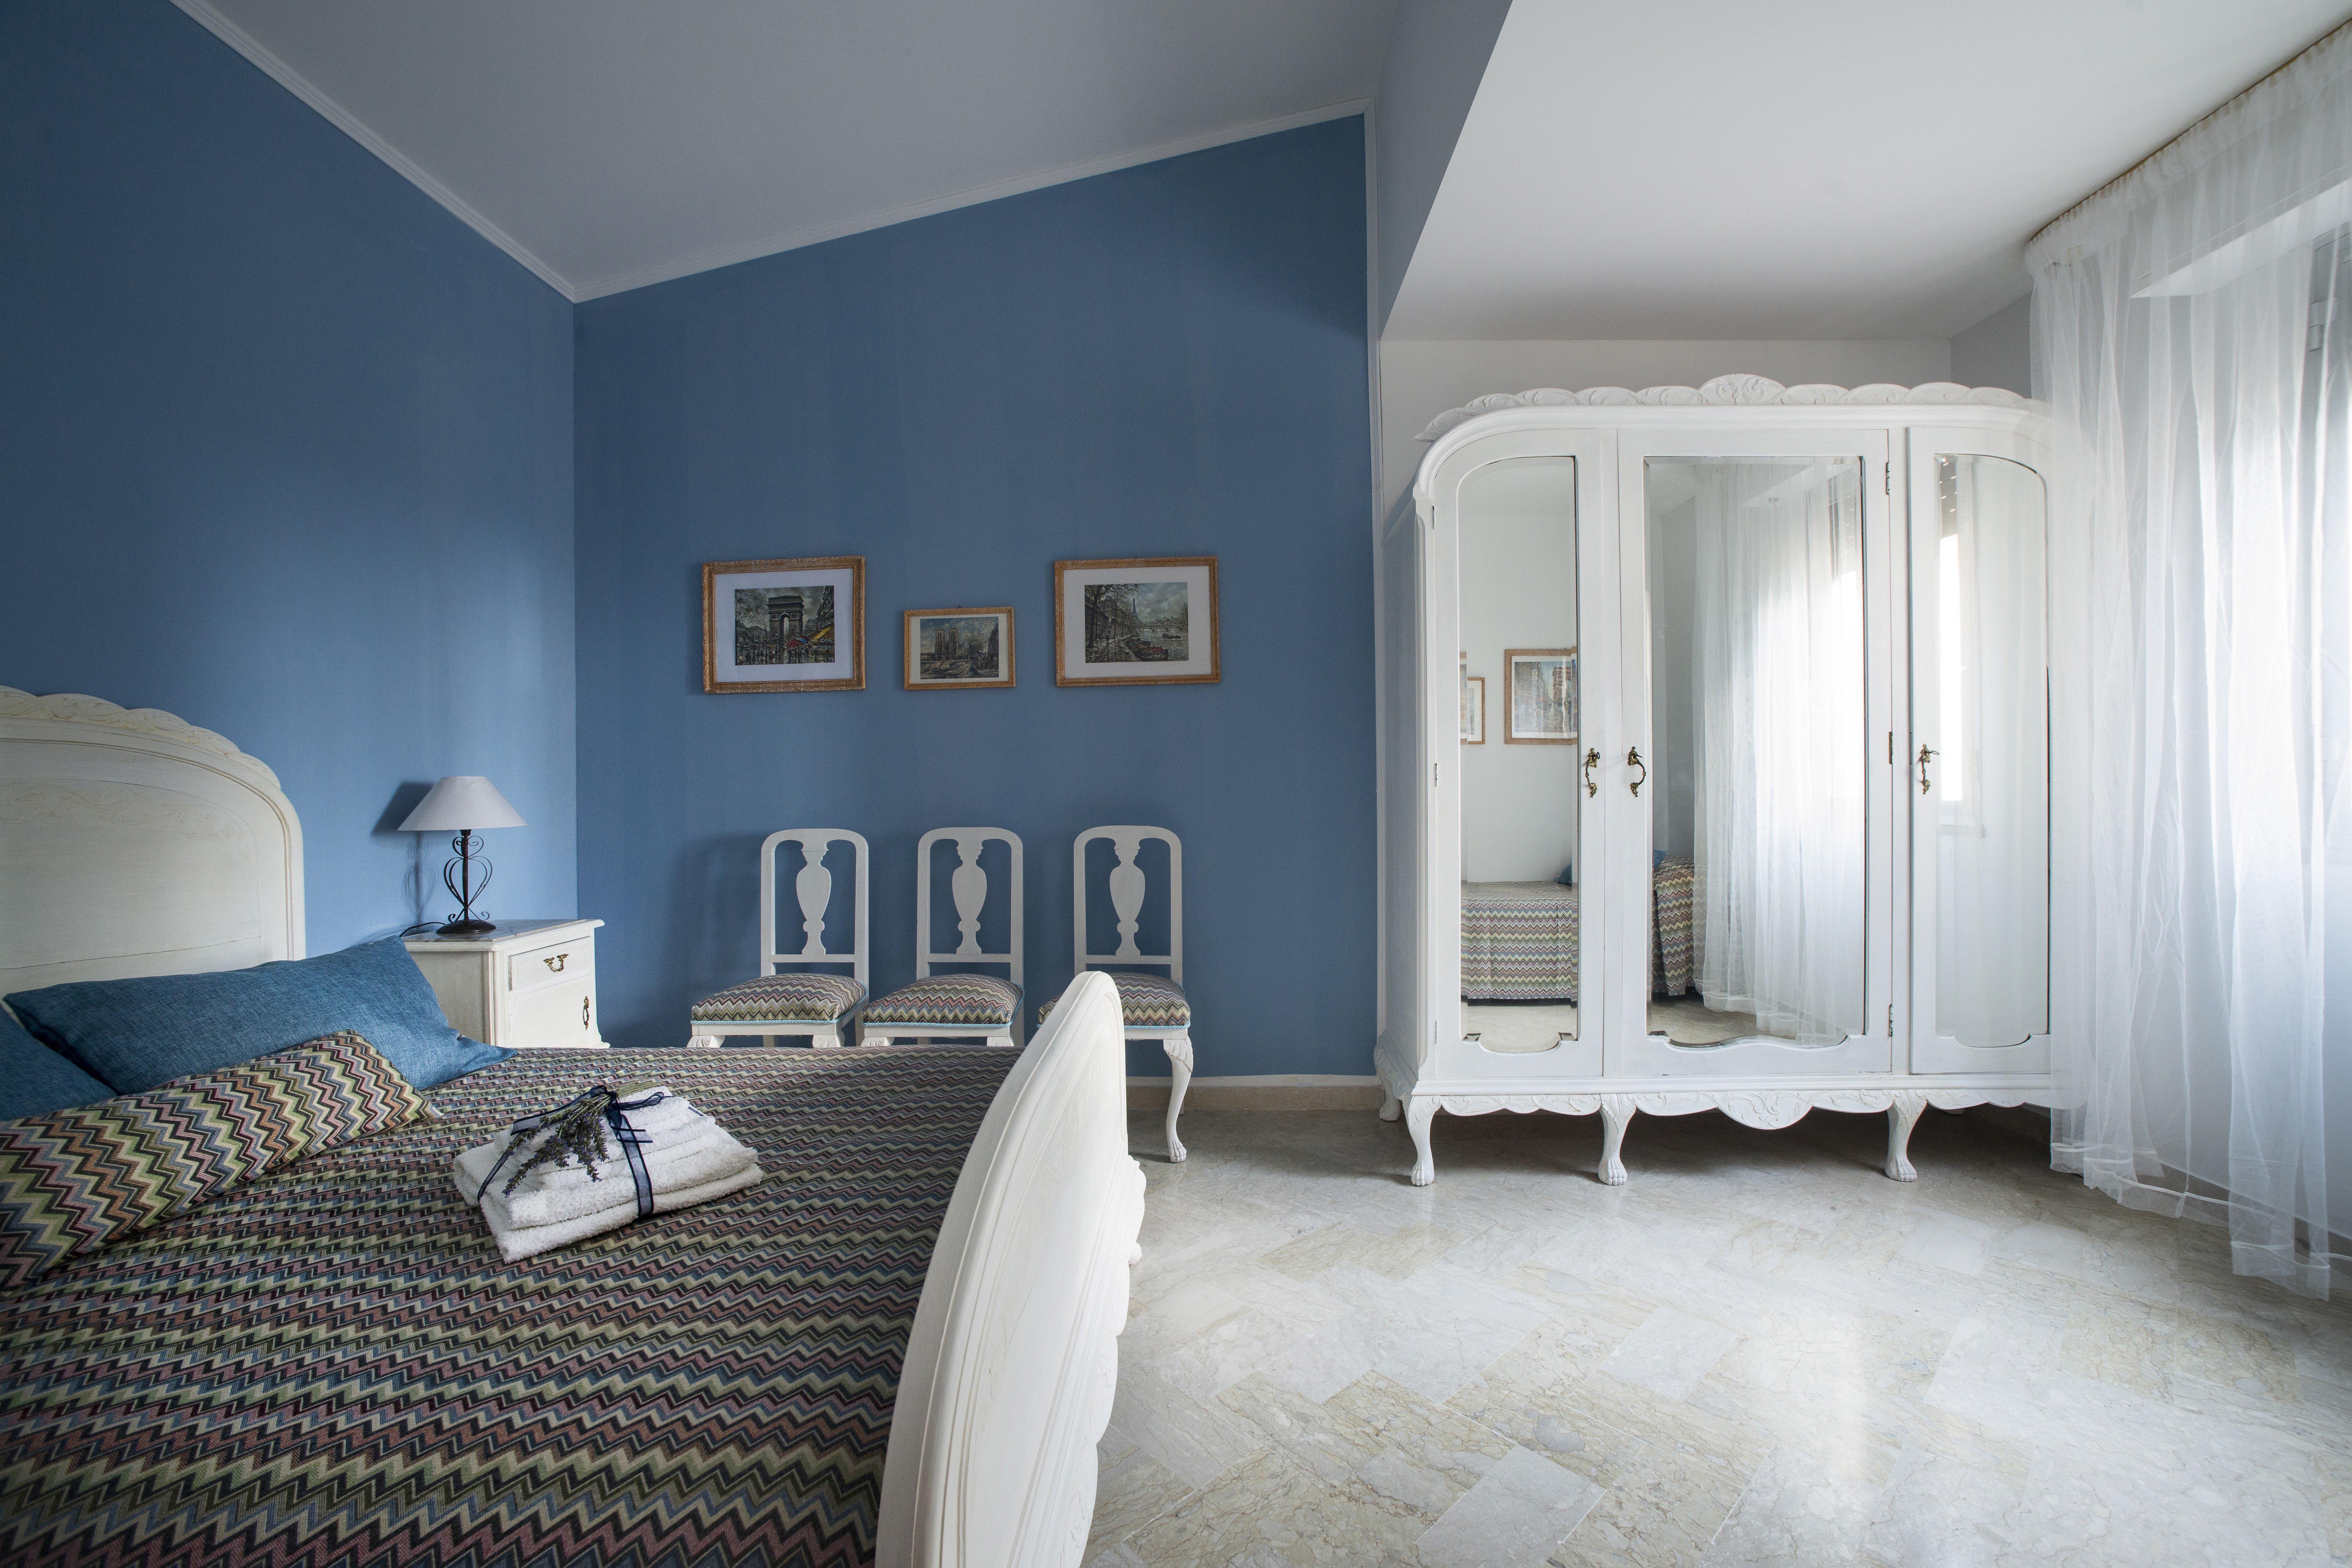 Holiday house Villa Scampati 7 Plätze am Meer mit Garten, Grill und Parkplatz (2388901), Alcamo, Trapani, Sicily, Italy, picture 6